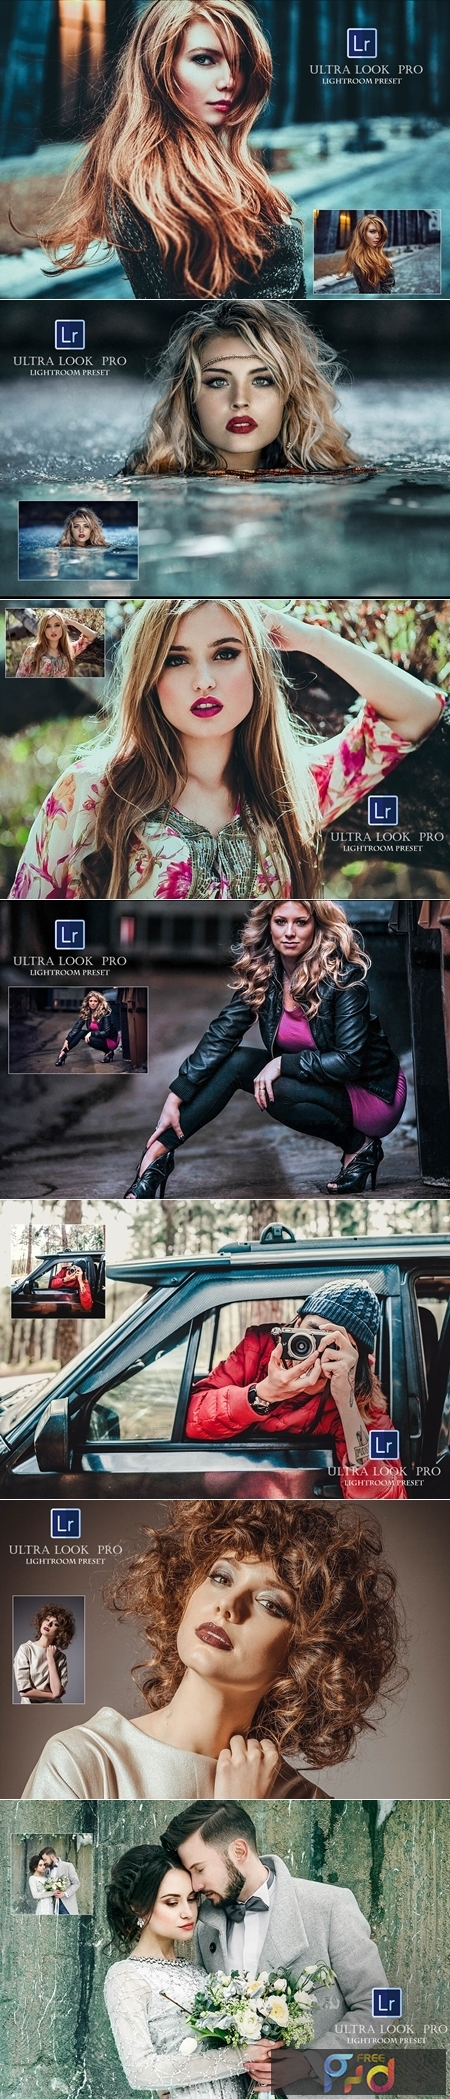 Ultra Look Pro Lightroom Presets 1